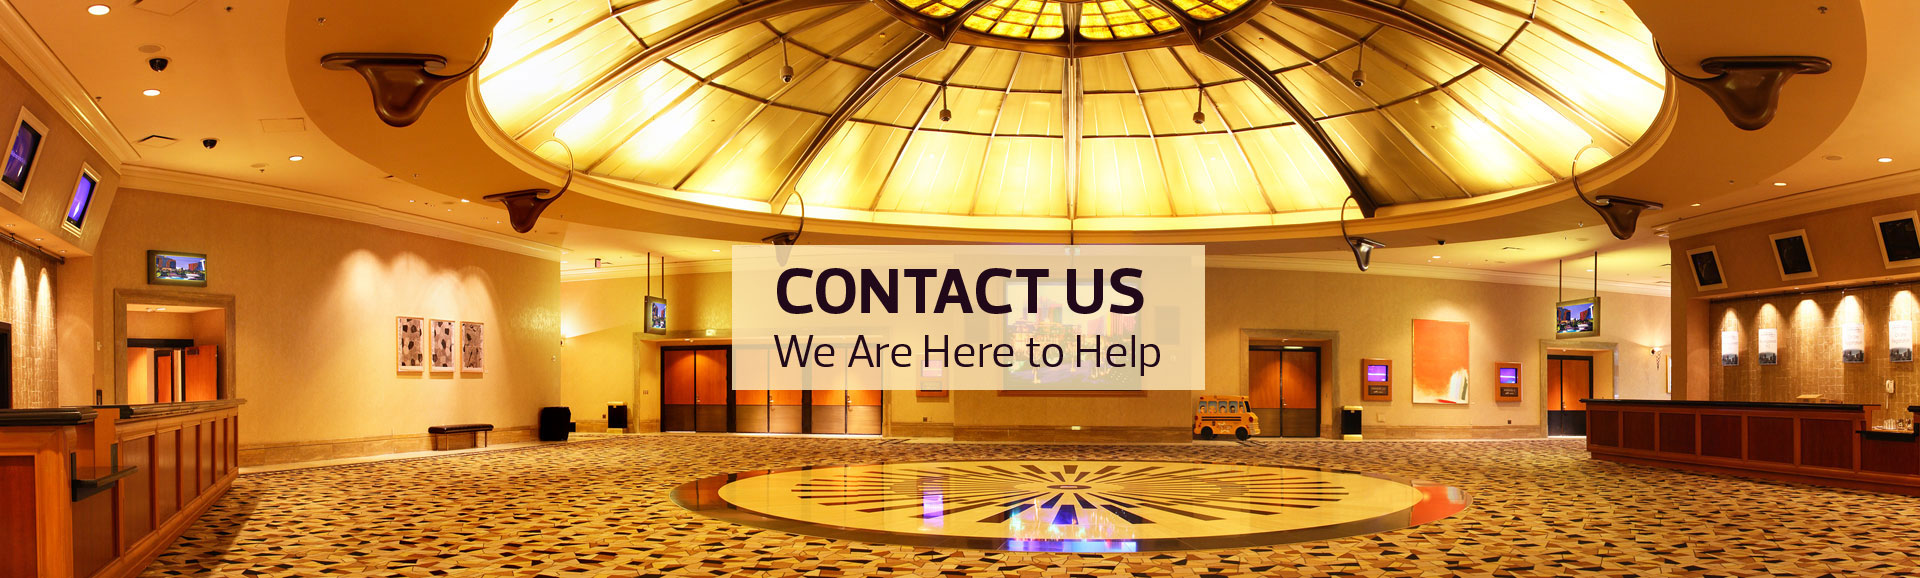 contact us las vegas better home show